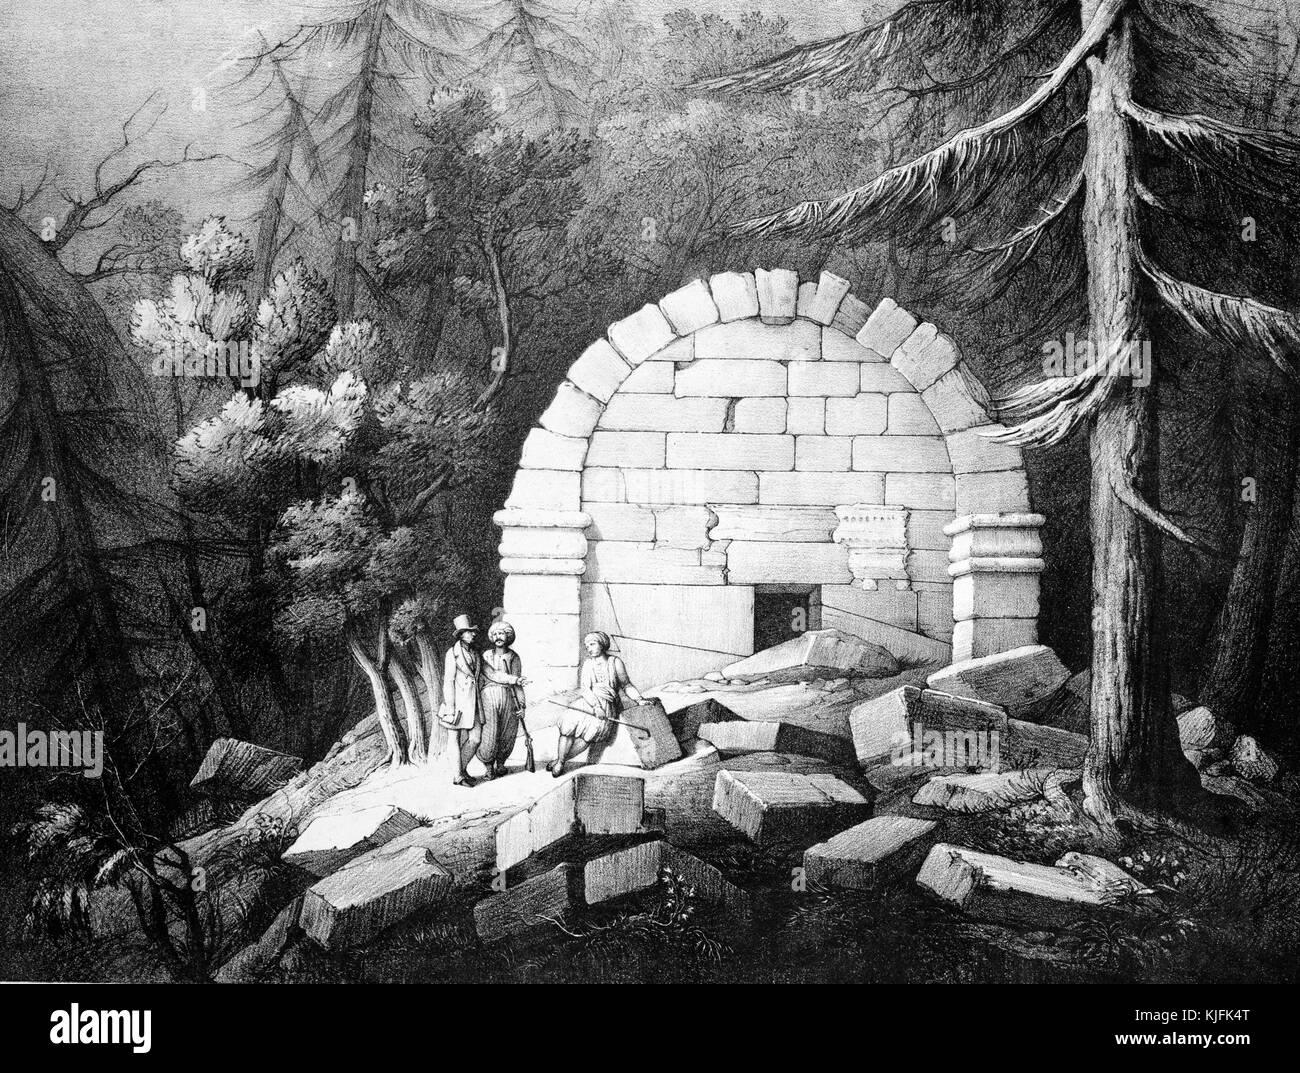 Print titled 'Sepulchral Vault near Affghan-Khiu [Avdan-Tevikiye]', depicting a vault construted of white - Stock Image